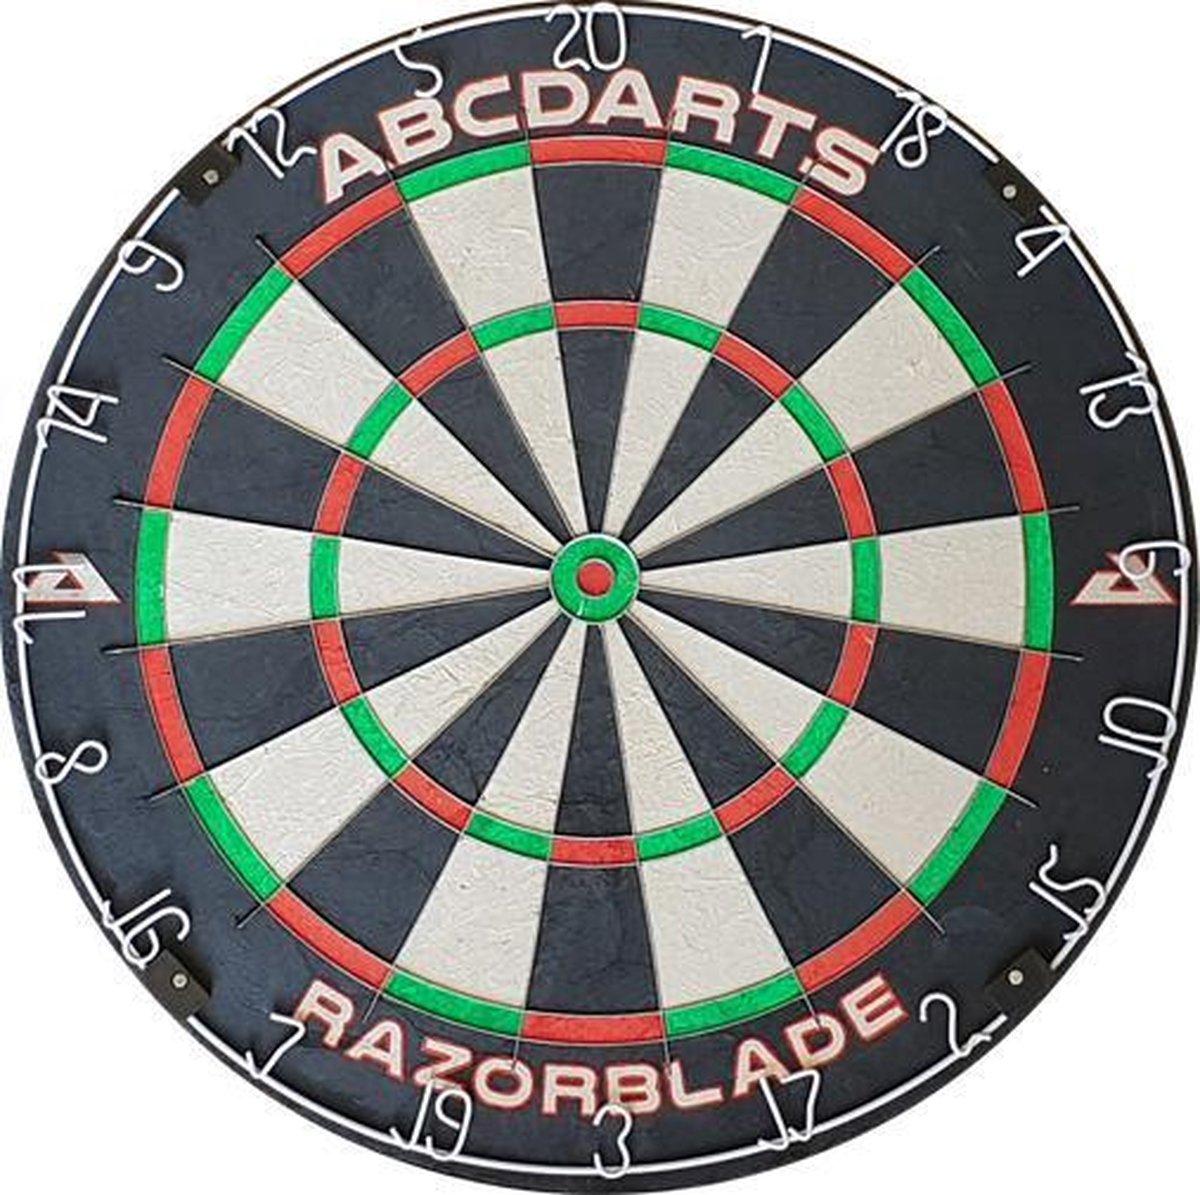 ABC Darts - Razorblade Dartbord - Sisal Wedstrijd Dartbord